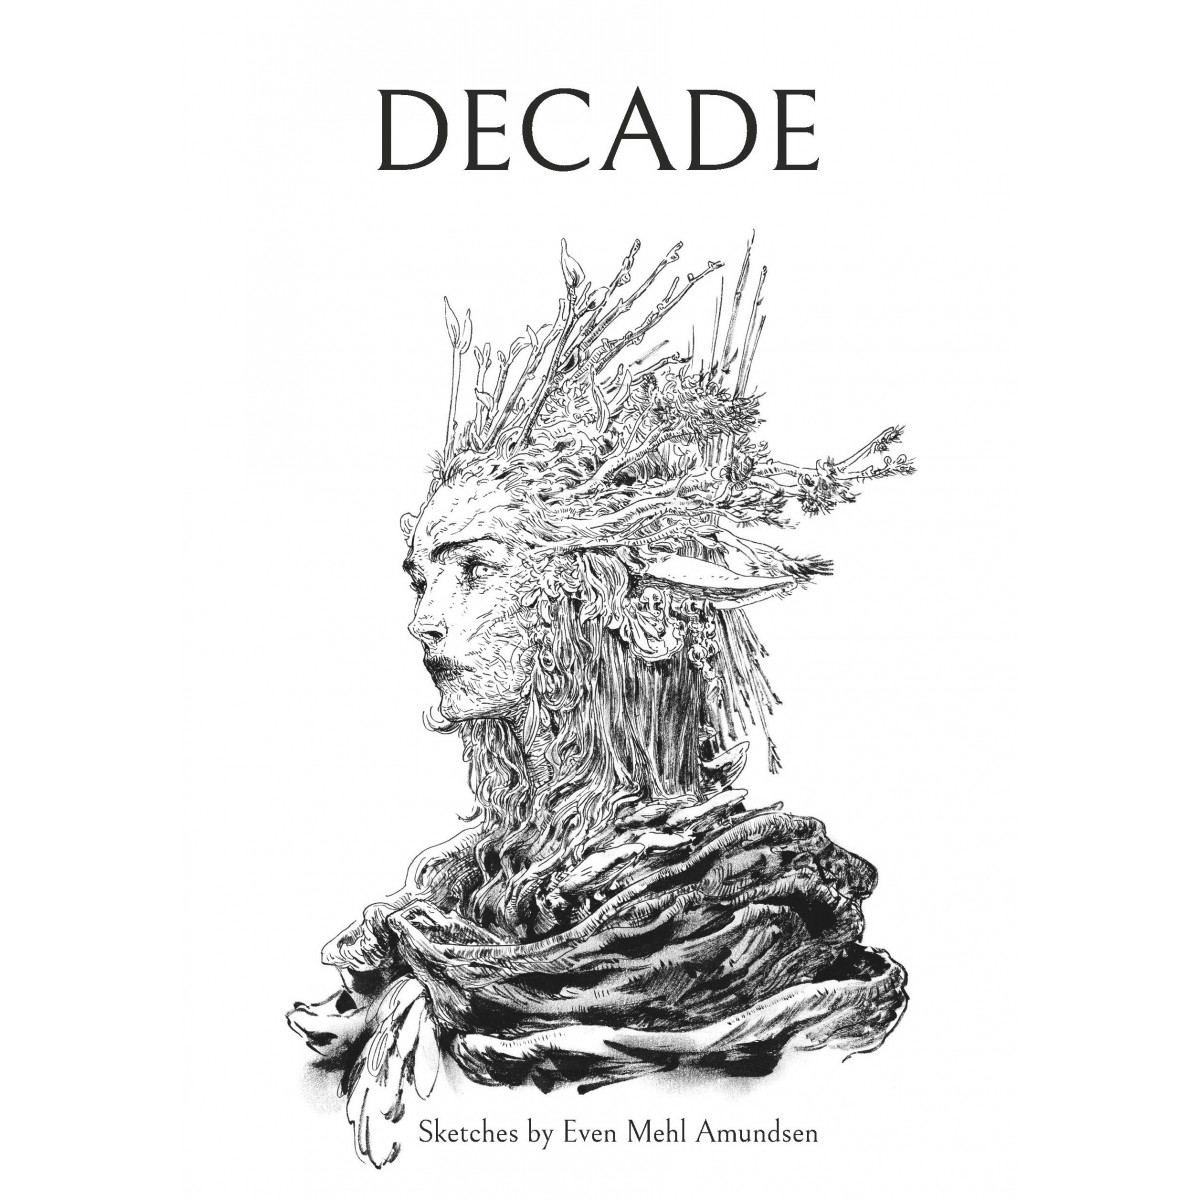 Decade: a sketchbook by Even Mehl Amundsen PRE-ORDER